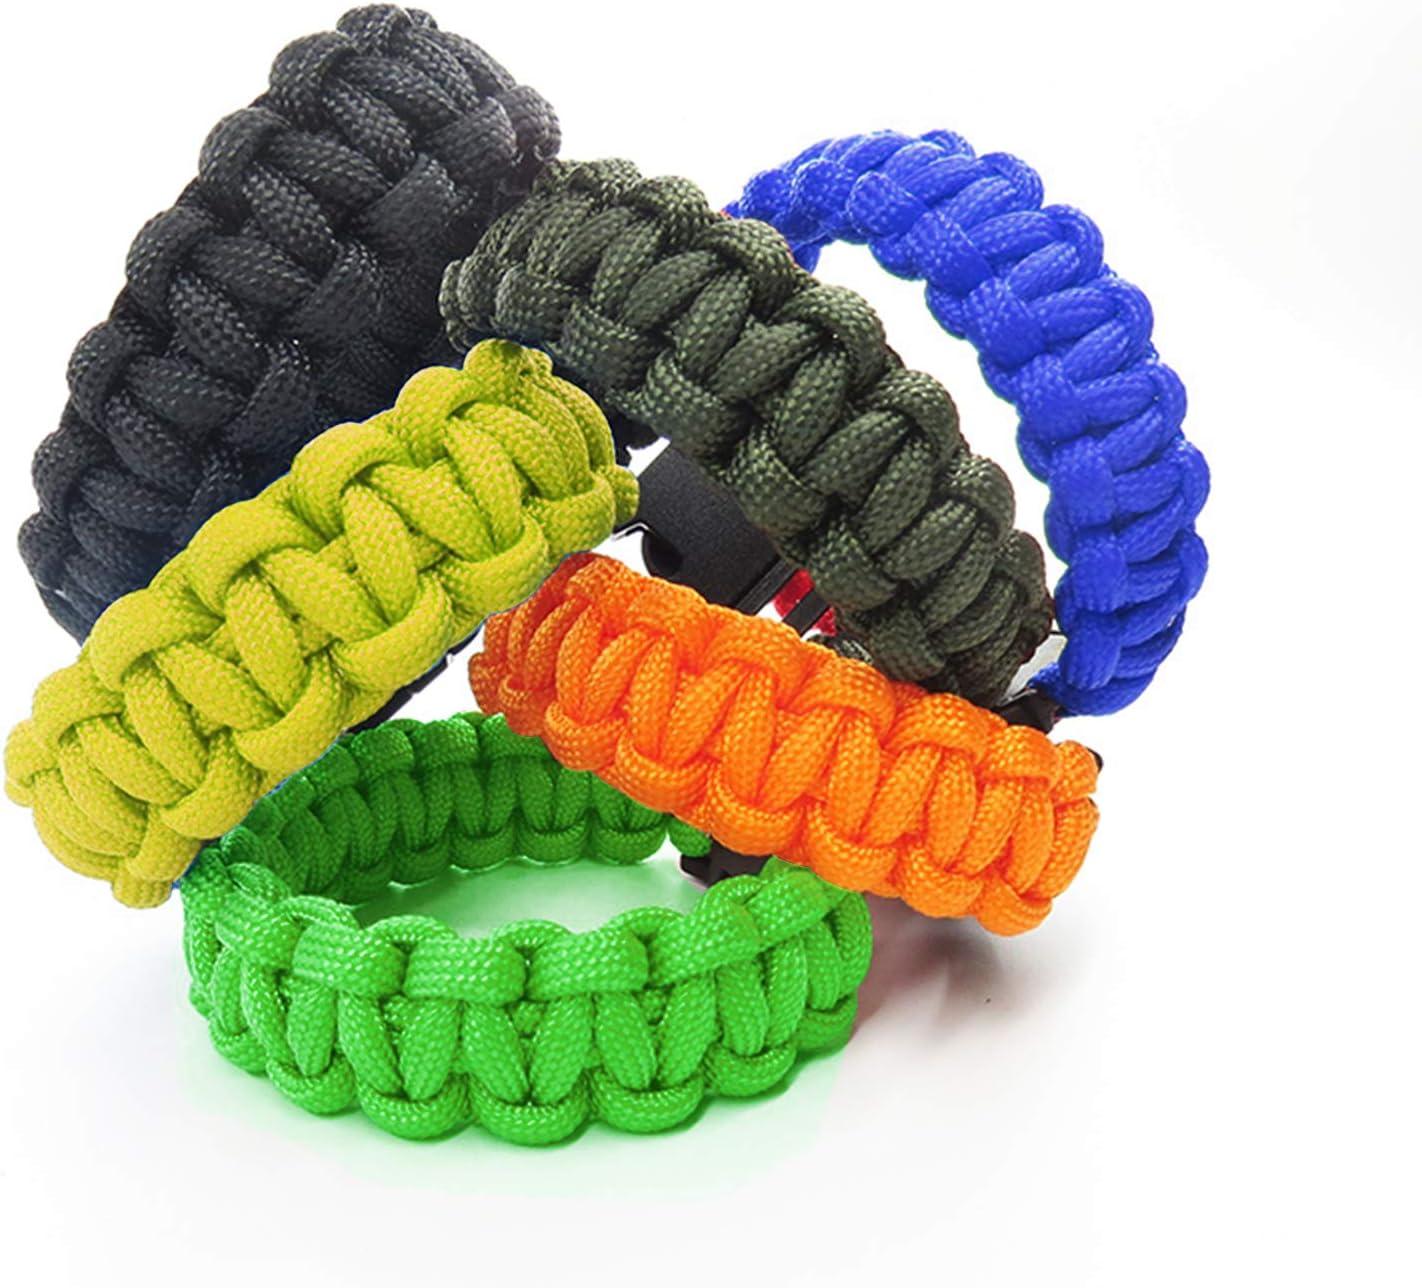 Matogle Paracord Schnur Seile 14 St/ück Multifarben Parachute Cord Armband Leinen B/änder mit 40 St/ück Schnallen Clips DIY-Schnallen-Armband-Seil f/ür DIY Armb/änder Schl/üsselanh/änger Climbing